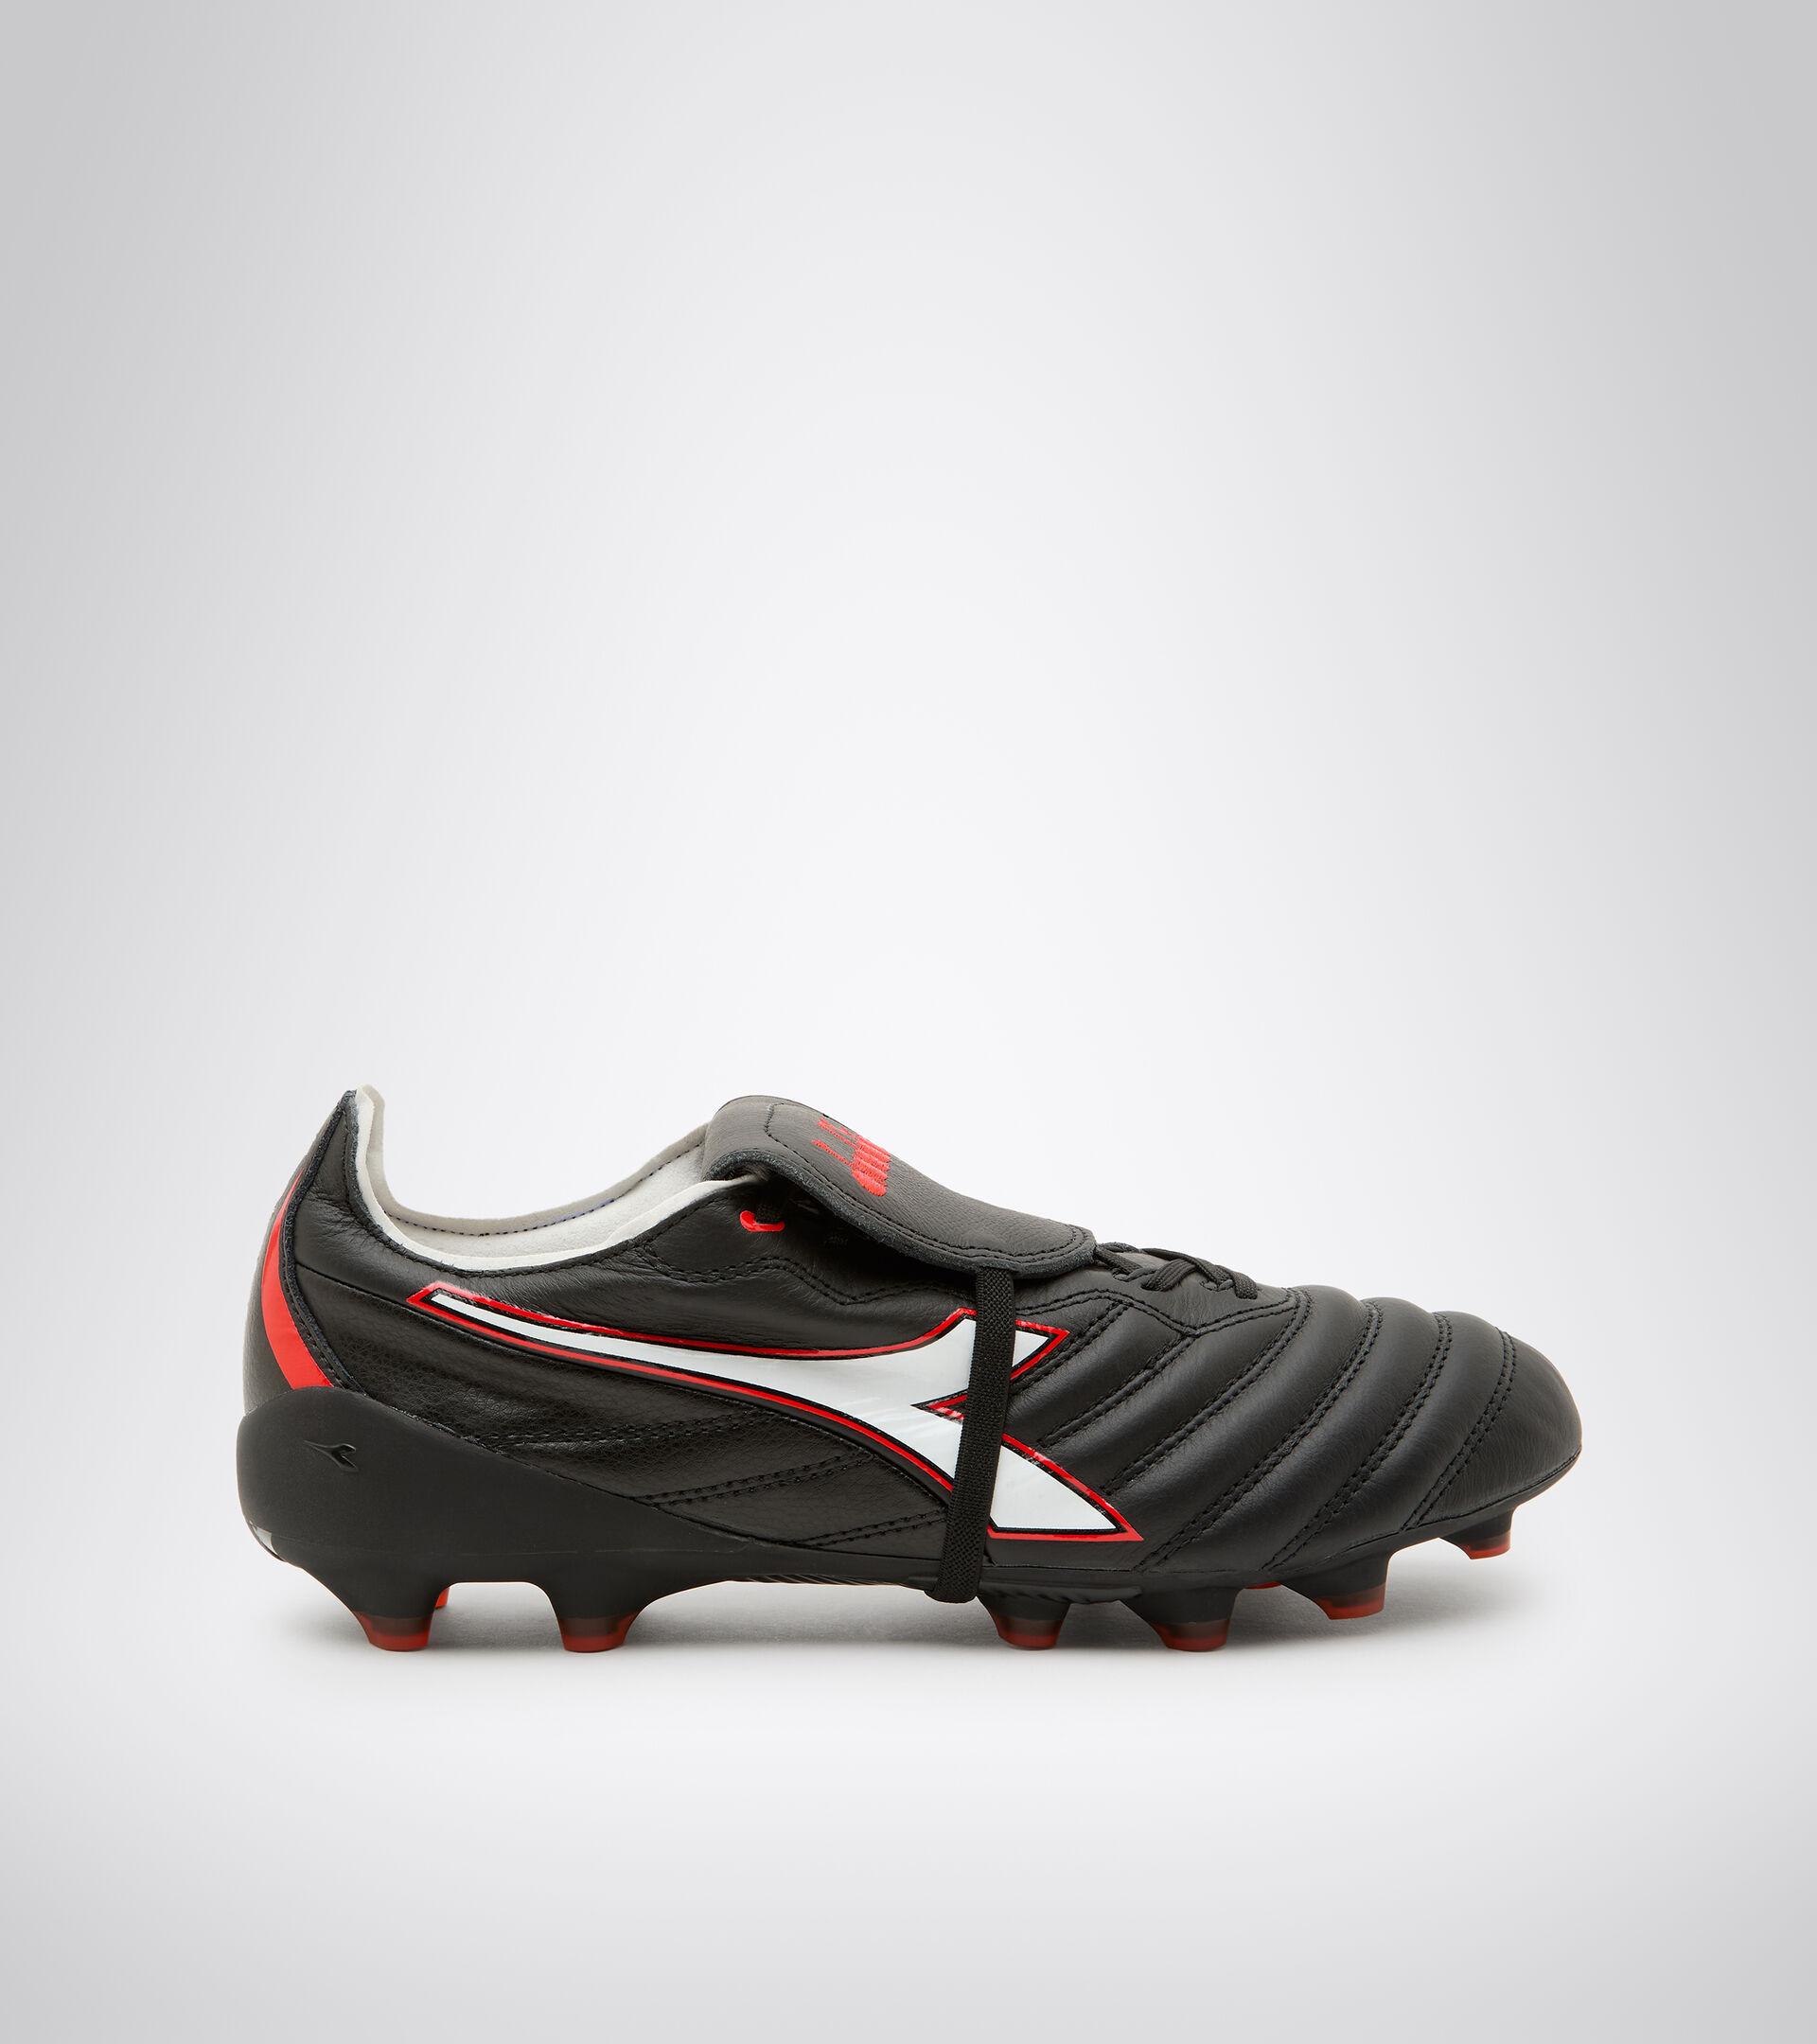 Footwear Sport UOMO BRASIL ELITE TECH T ITA LPX NEGRO/BLANCO/ROJO FLUO Diadora